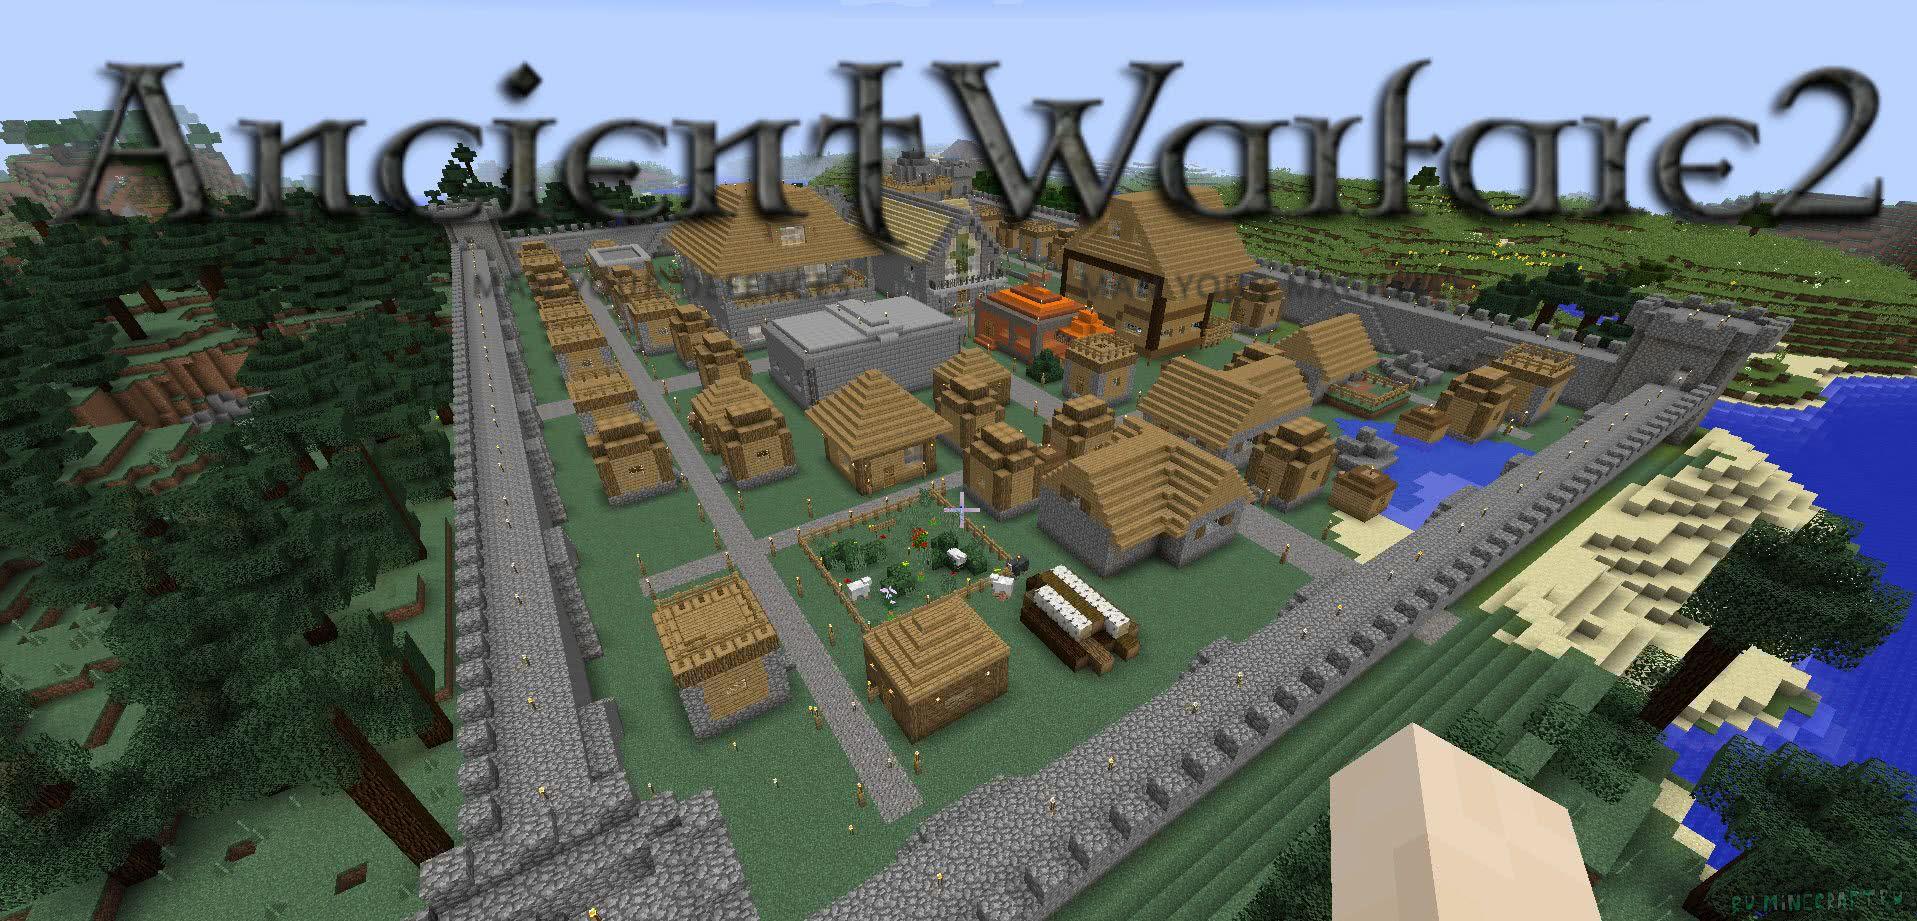 Ancient Warfare 2 ancient warfare 2 [1.12.2] [1.7.10] » Скачать моды для Майнкрафт